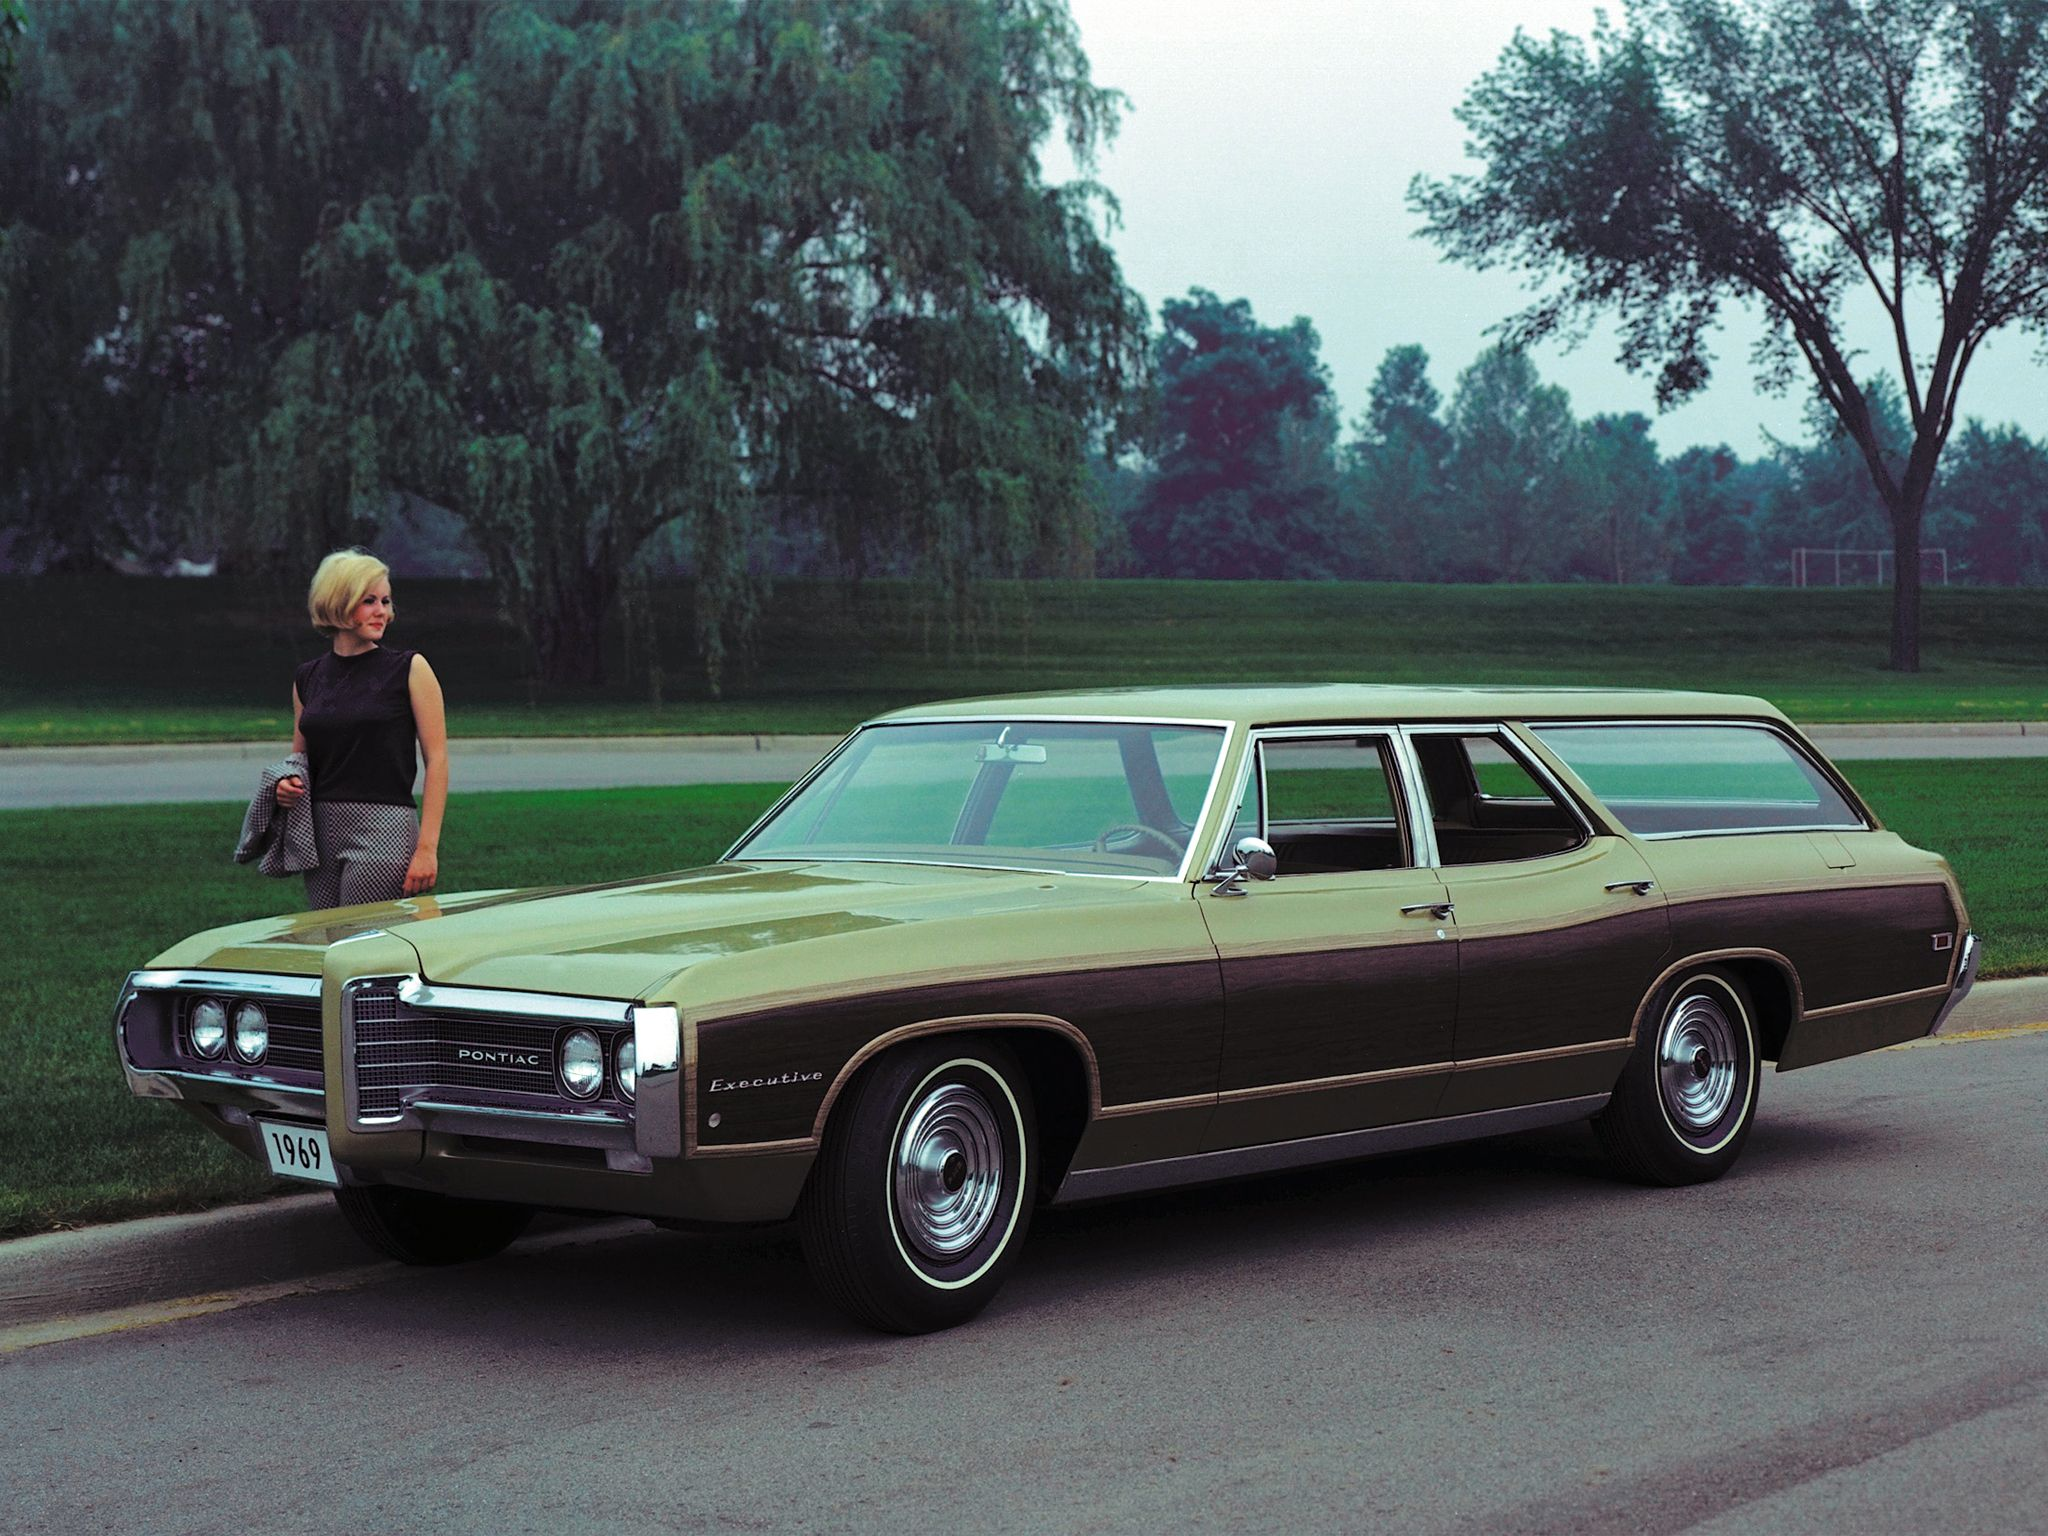 1969 Pontiac Executive Safari 428 factory photo   American